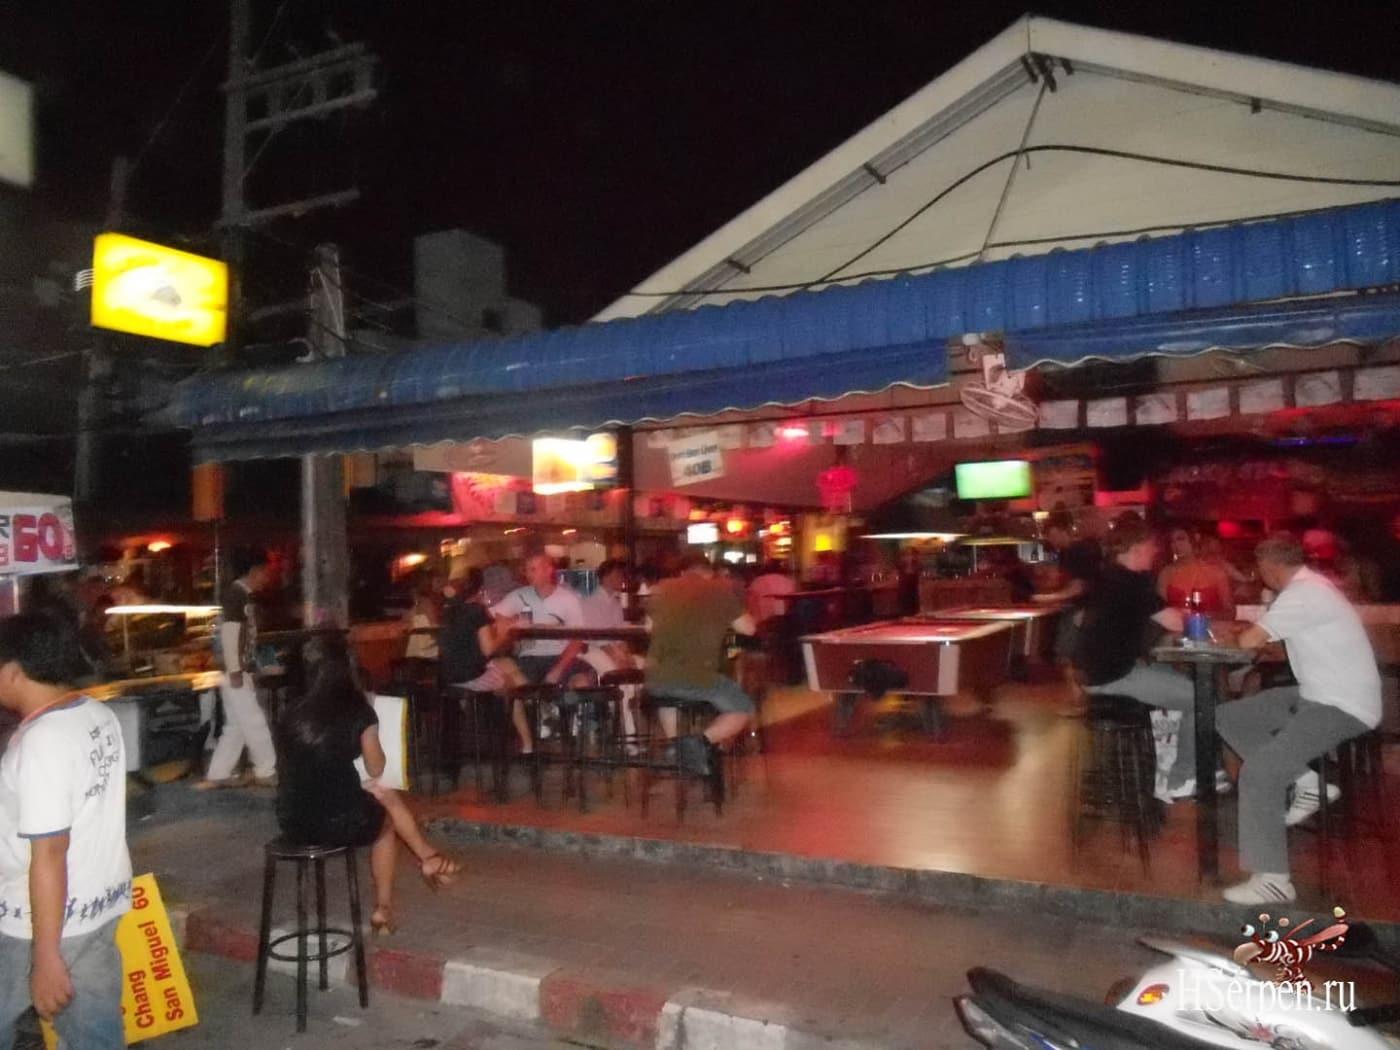 Заметки про тайский секс, часть 1